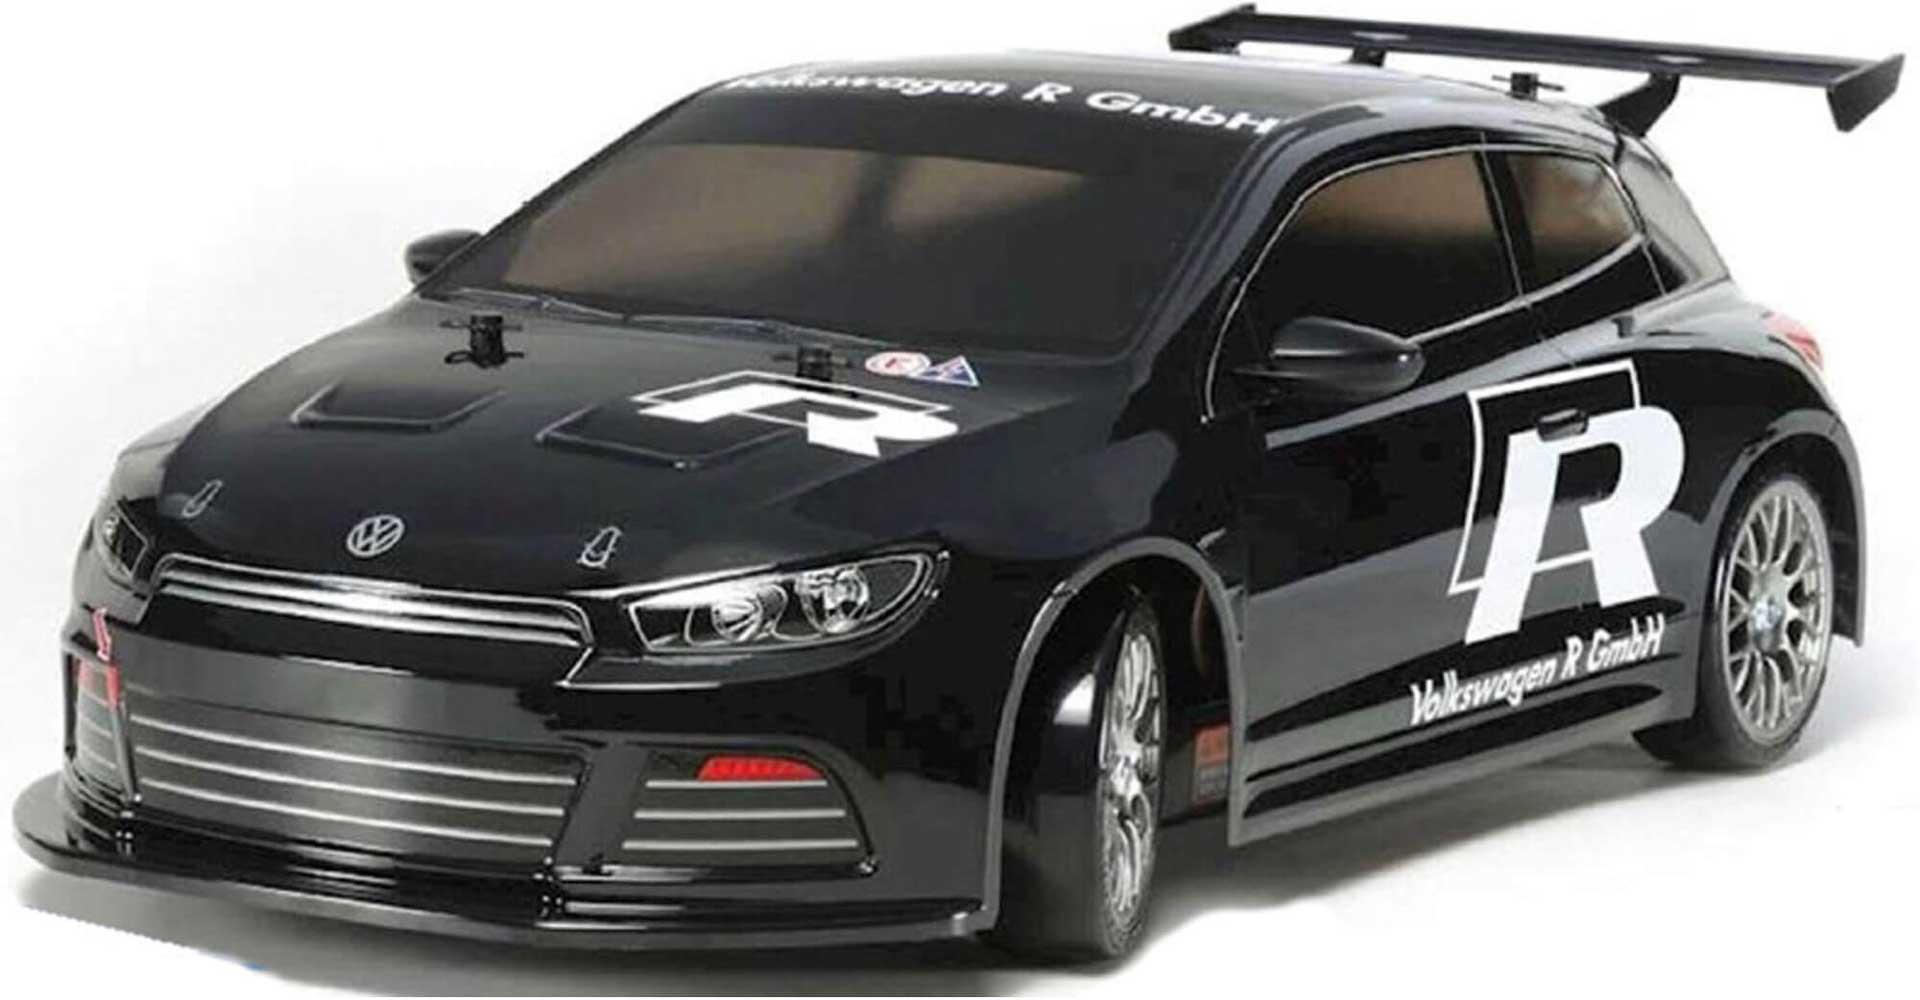 TAMIYA VW Scirocco GT24 R-Line TT-01E 1/10 EP